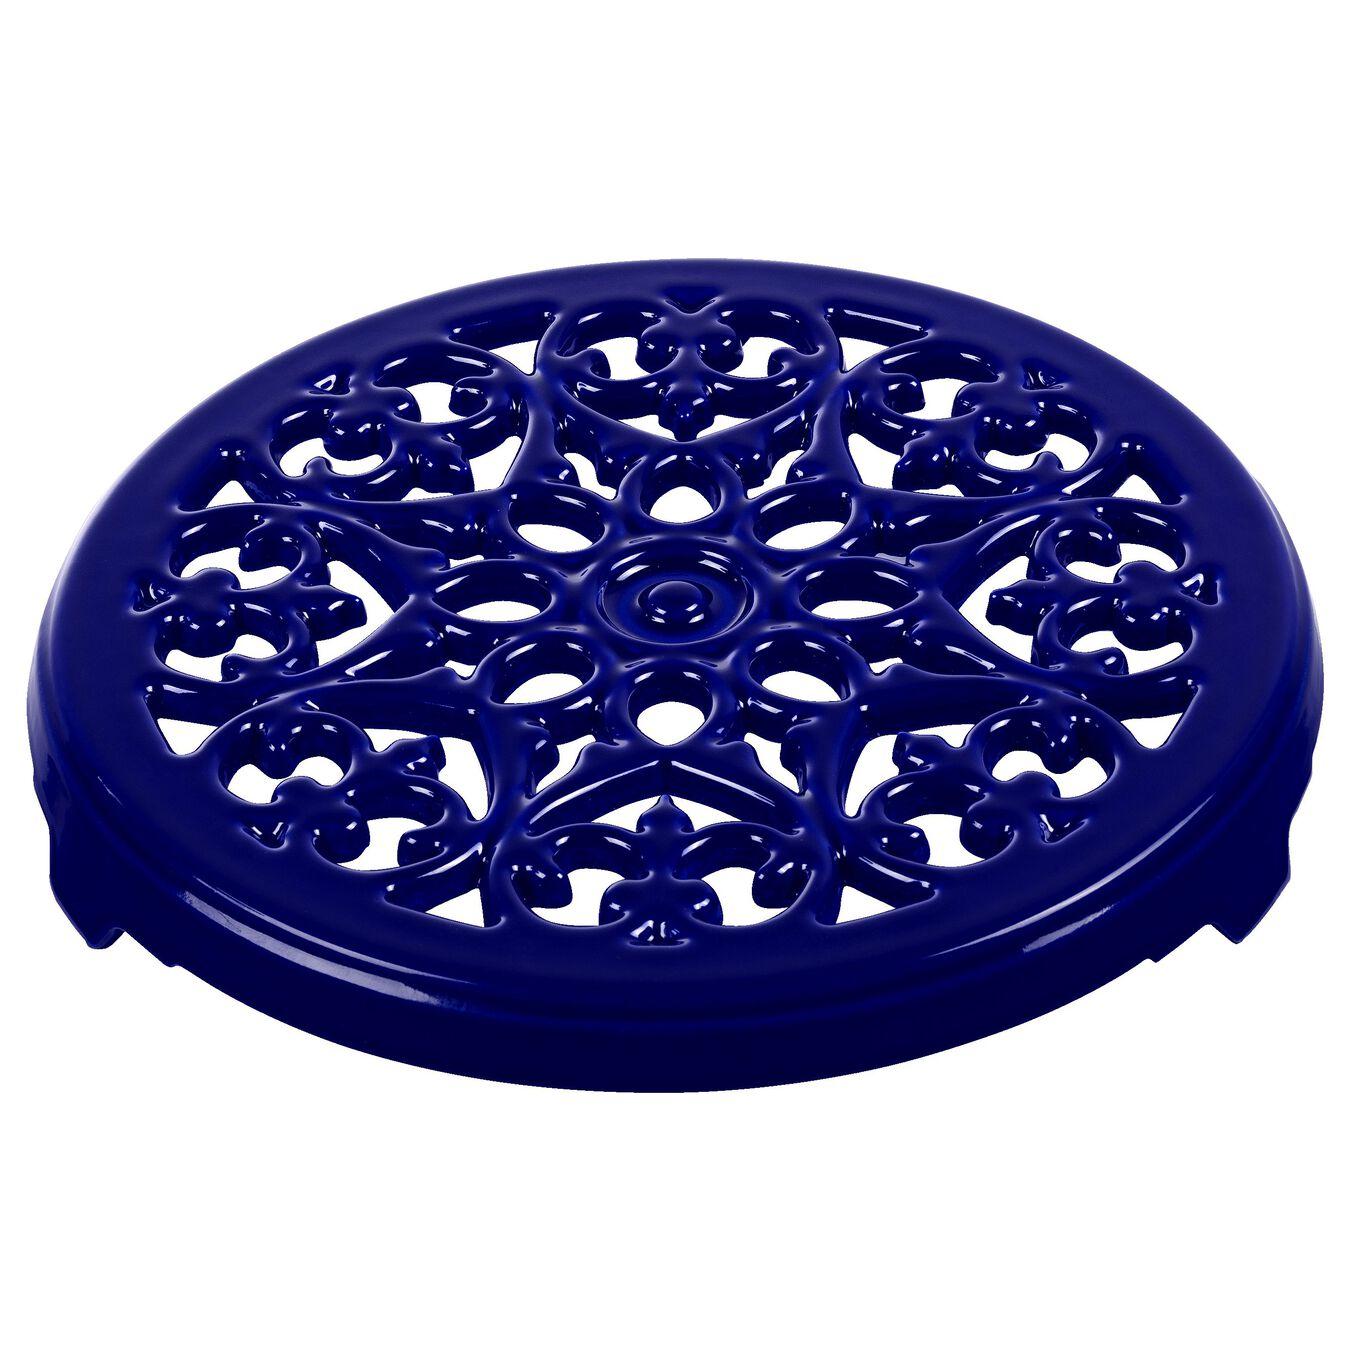 23 cm round Cast iron Trivet, Dark-Blue,,large 1